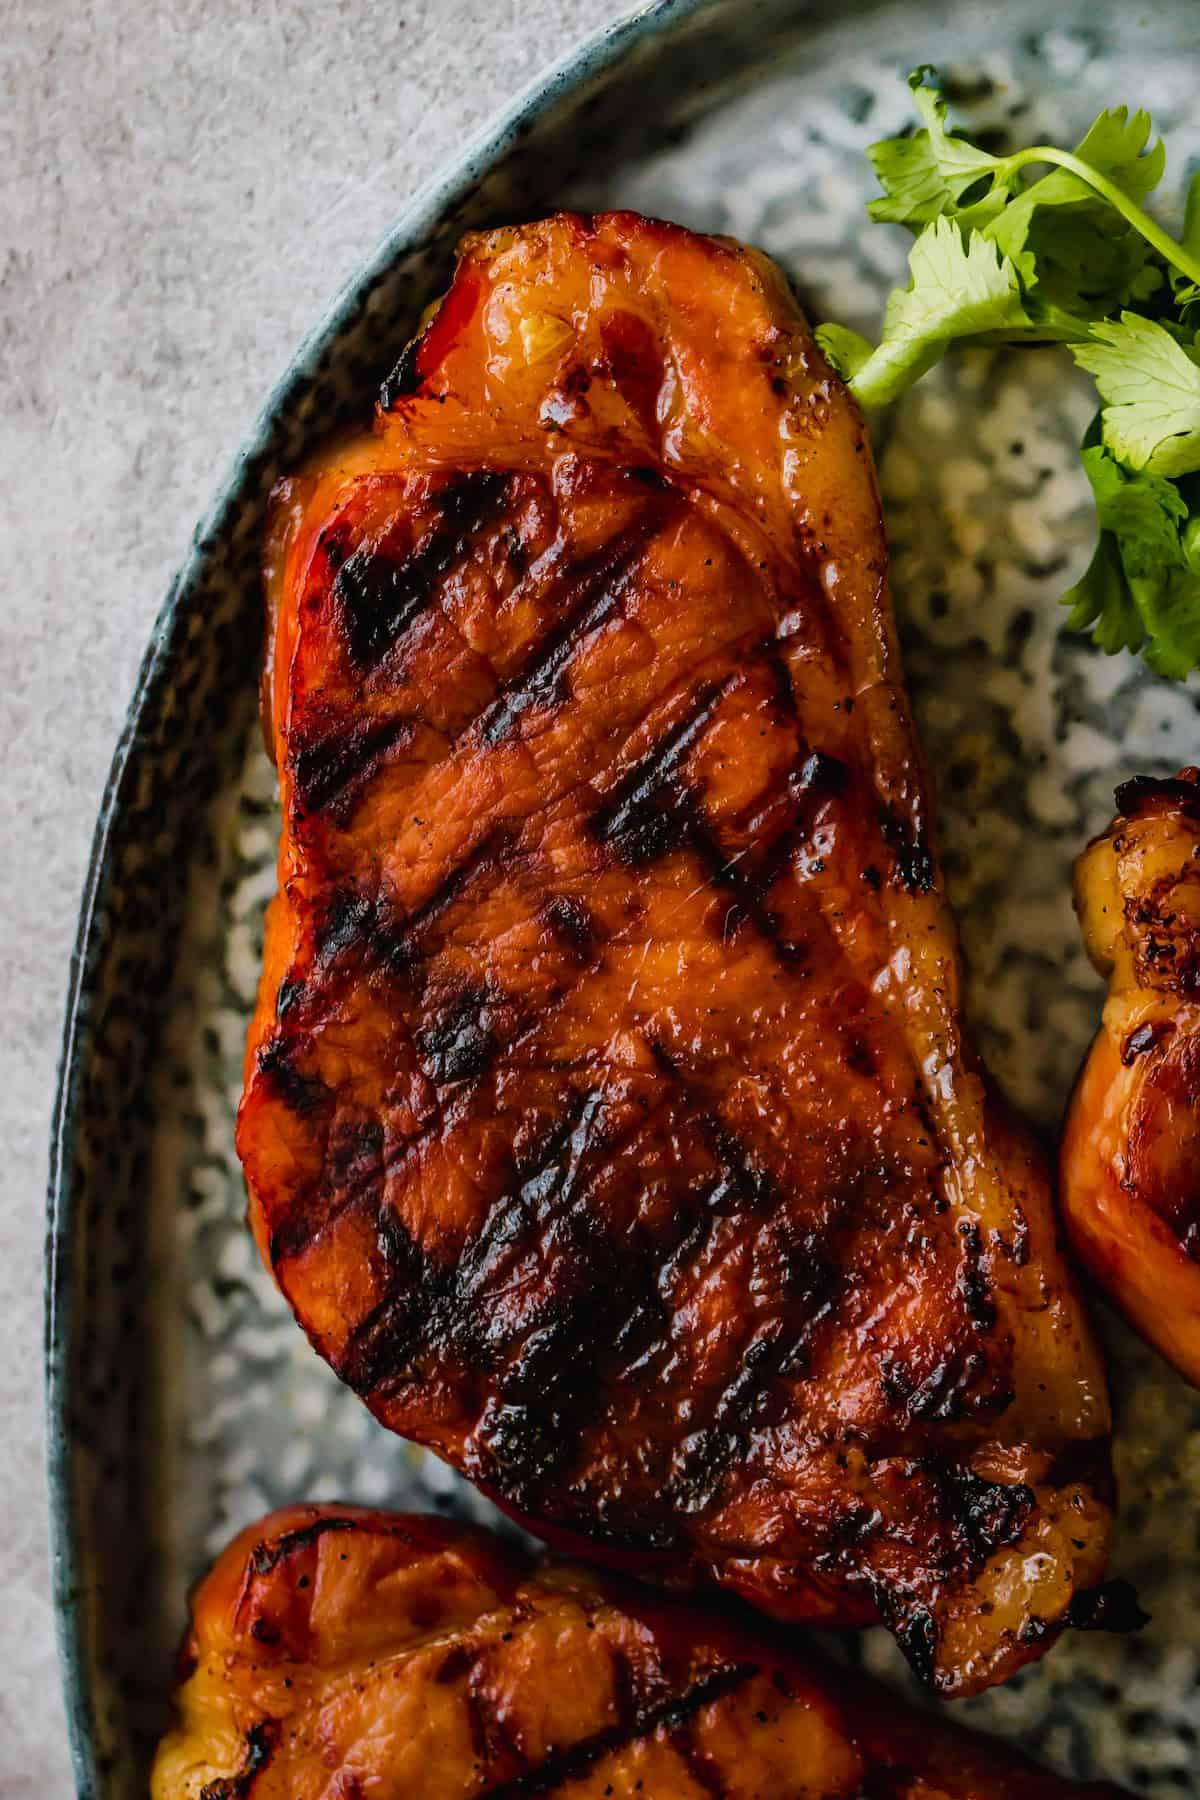 Honey soy pork chops on a plate.